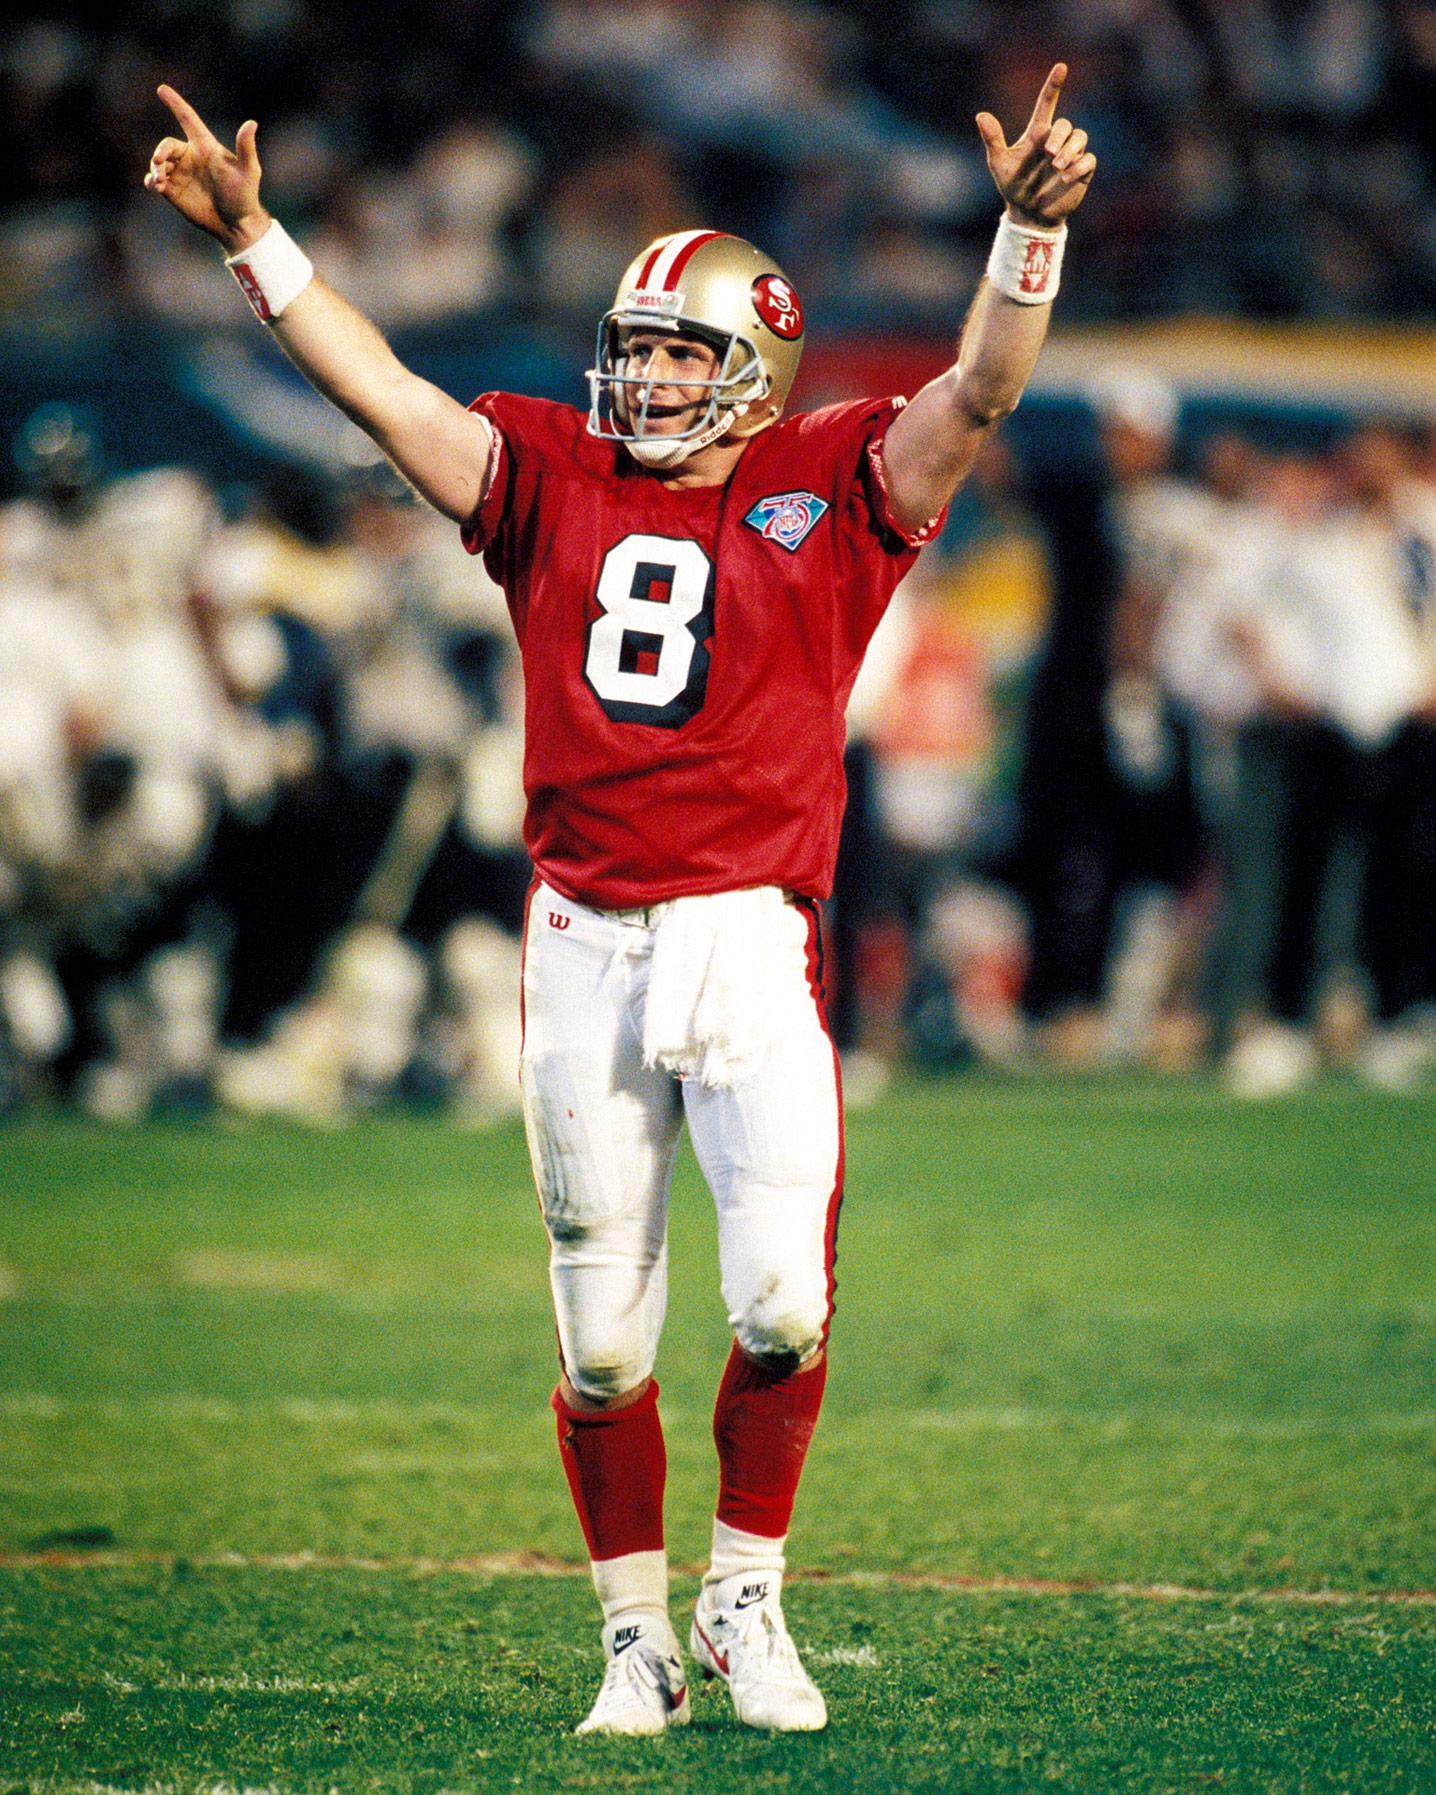 Steve Young - Super Bowl XXIX (24/36, 325 yards, 6 TDs)